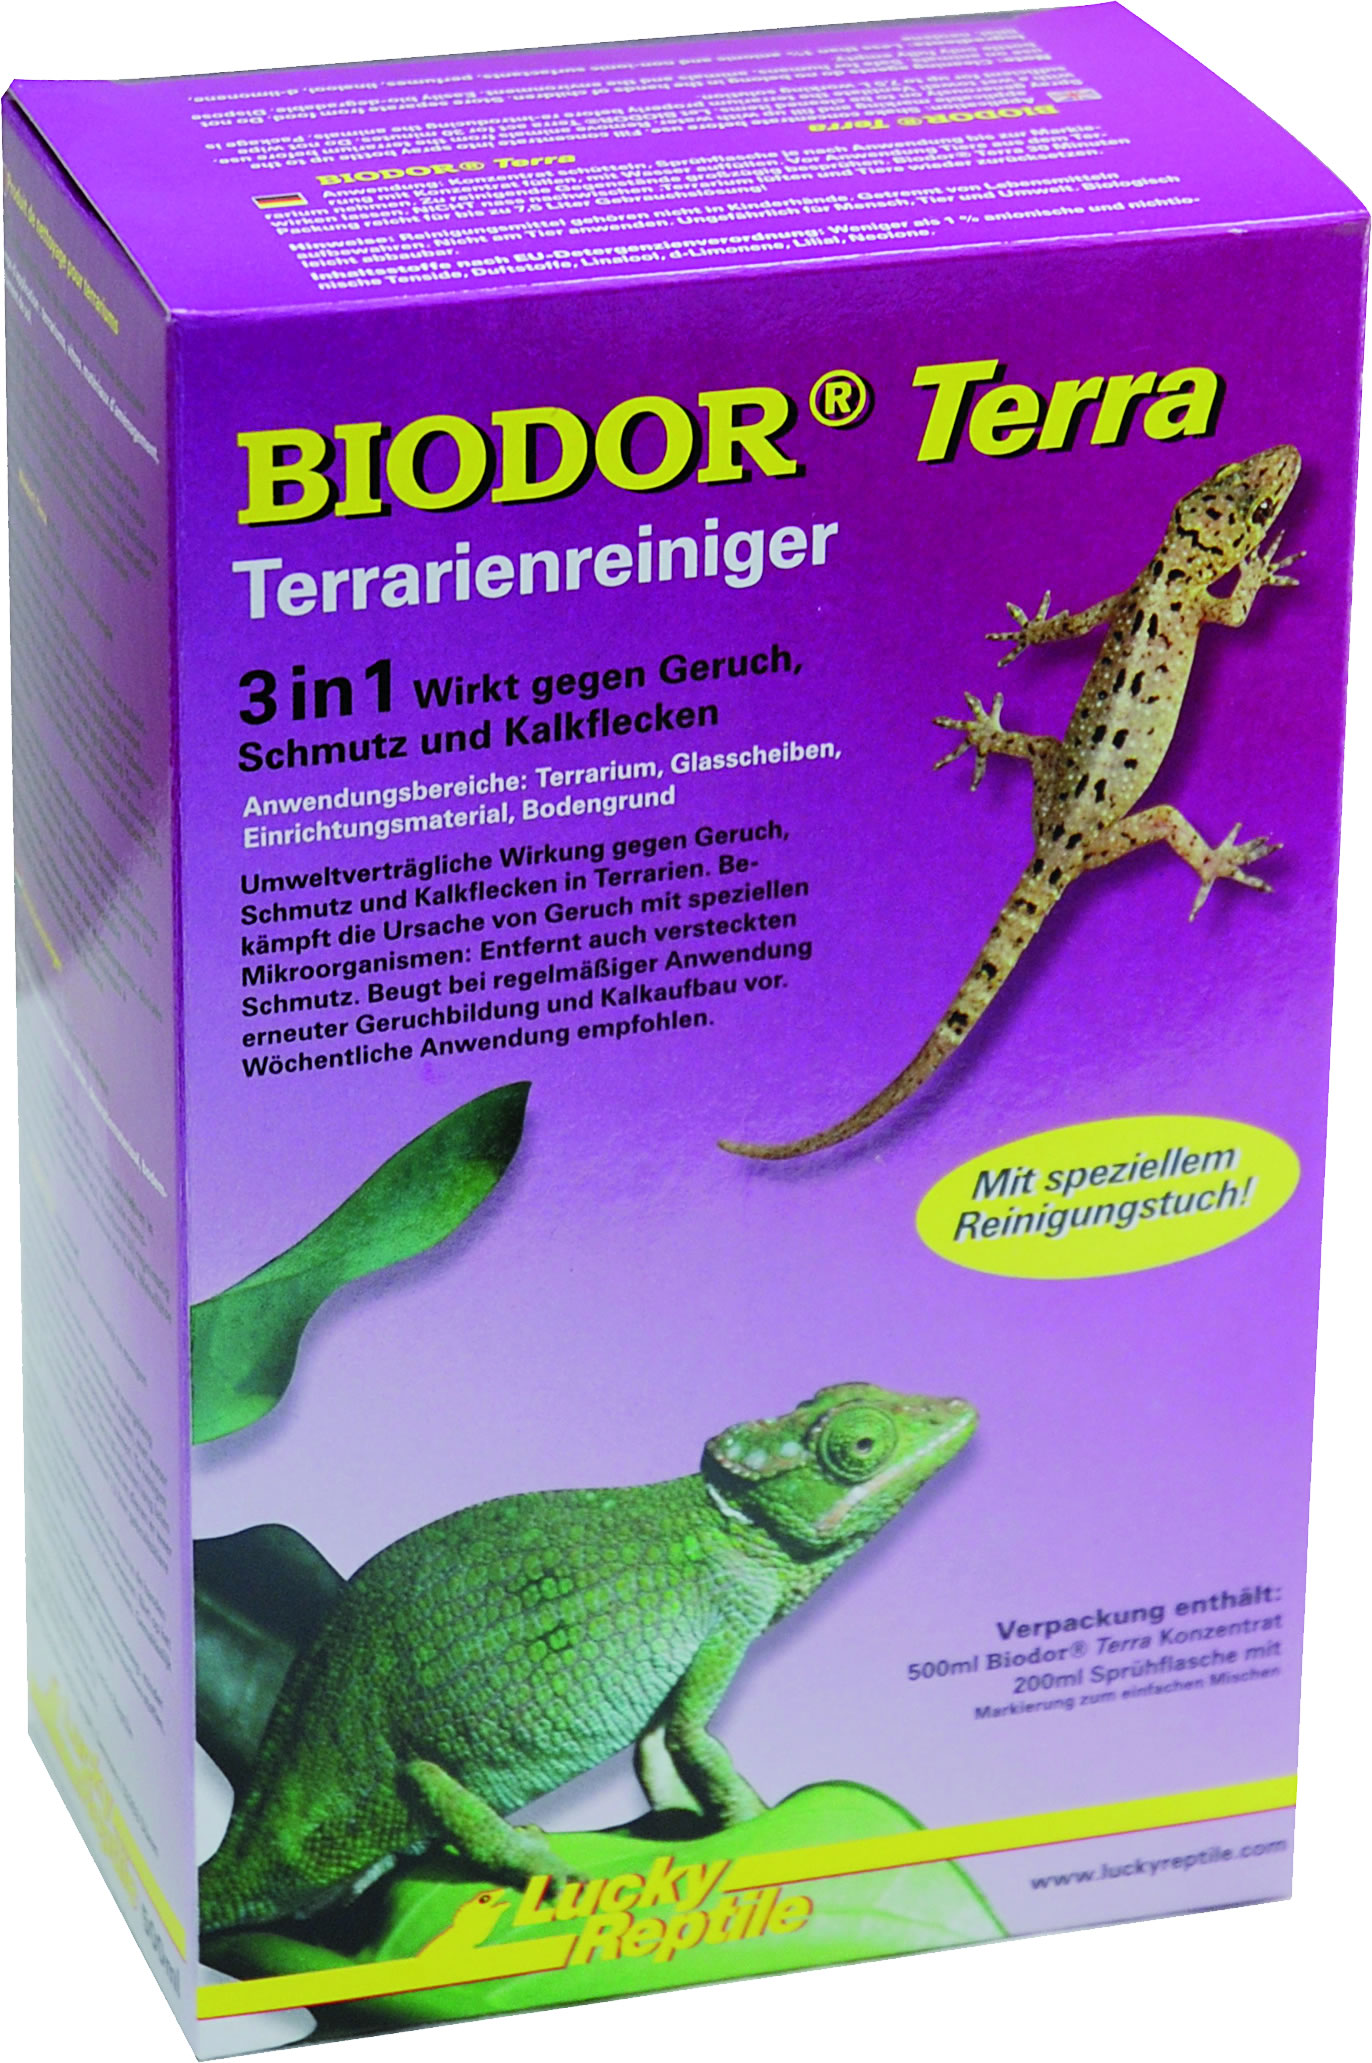 Lucky Reptile BIODOR Terra Terrarienreiniger - 500 ml